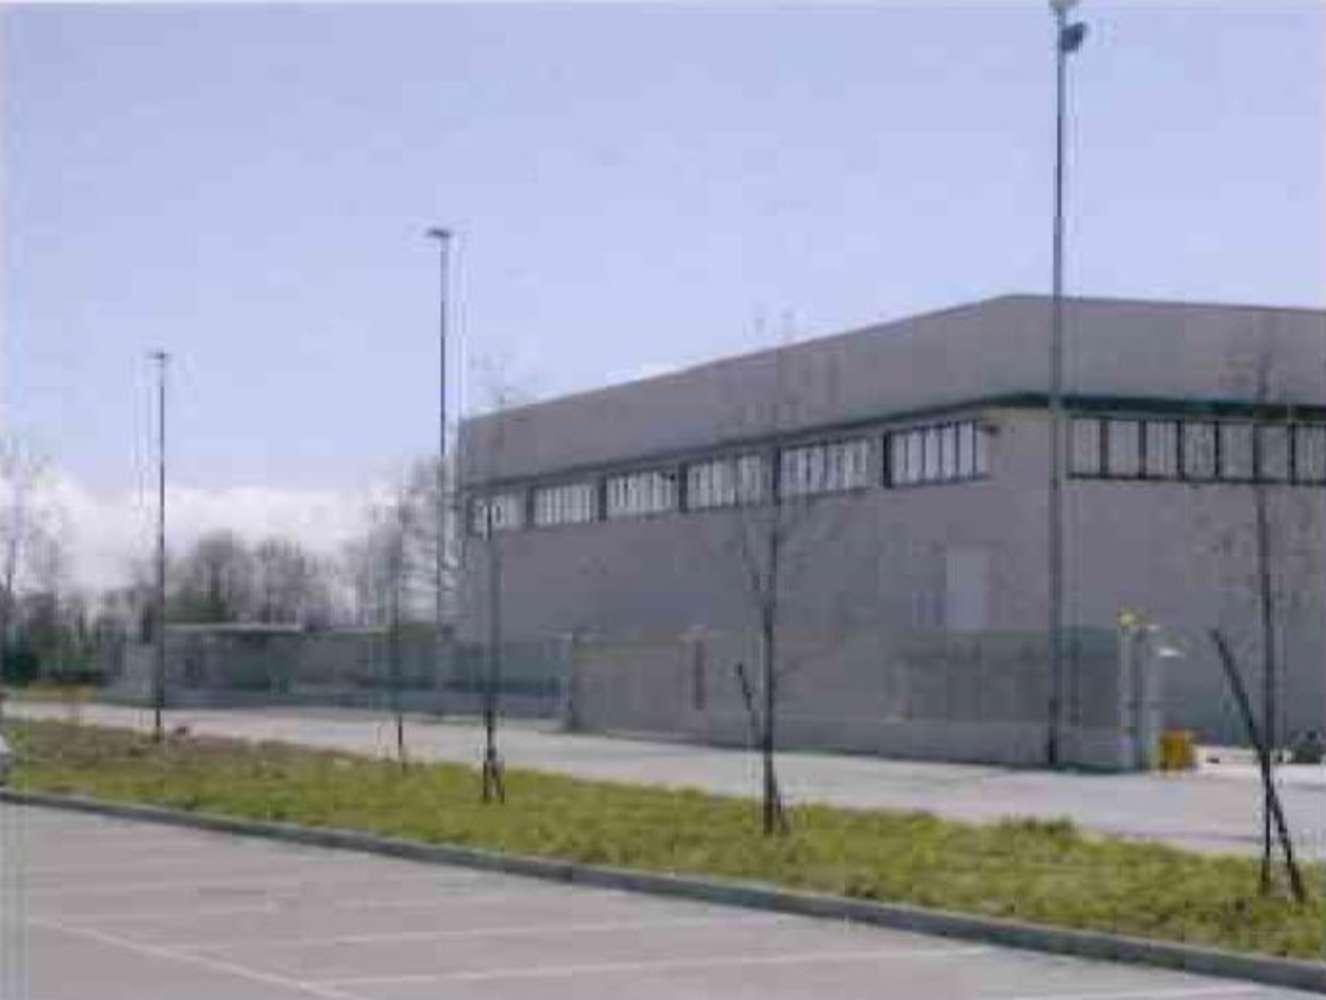 Magazzini industriali e logistici Livraga, 26814 - Livraga - 9200249